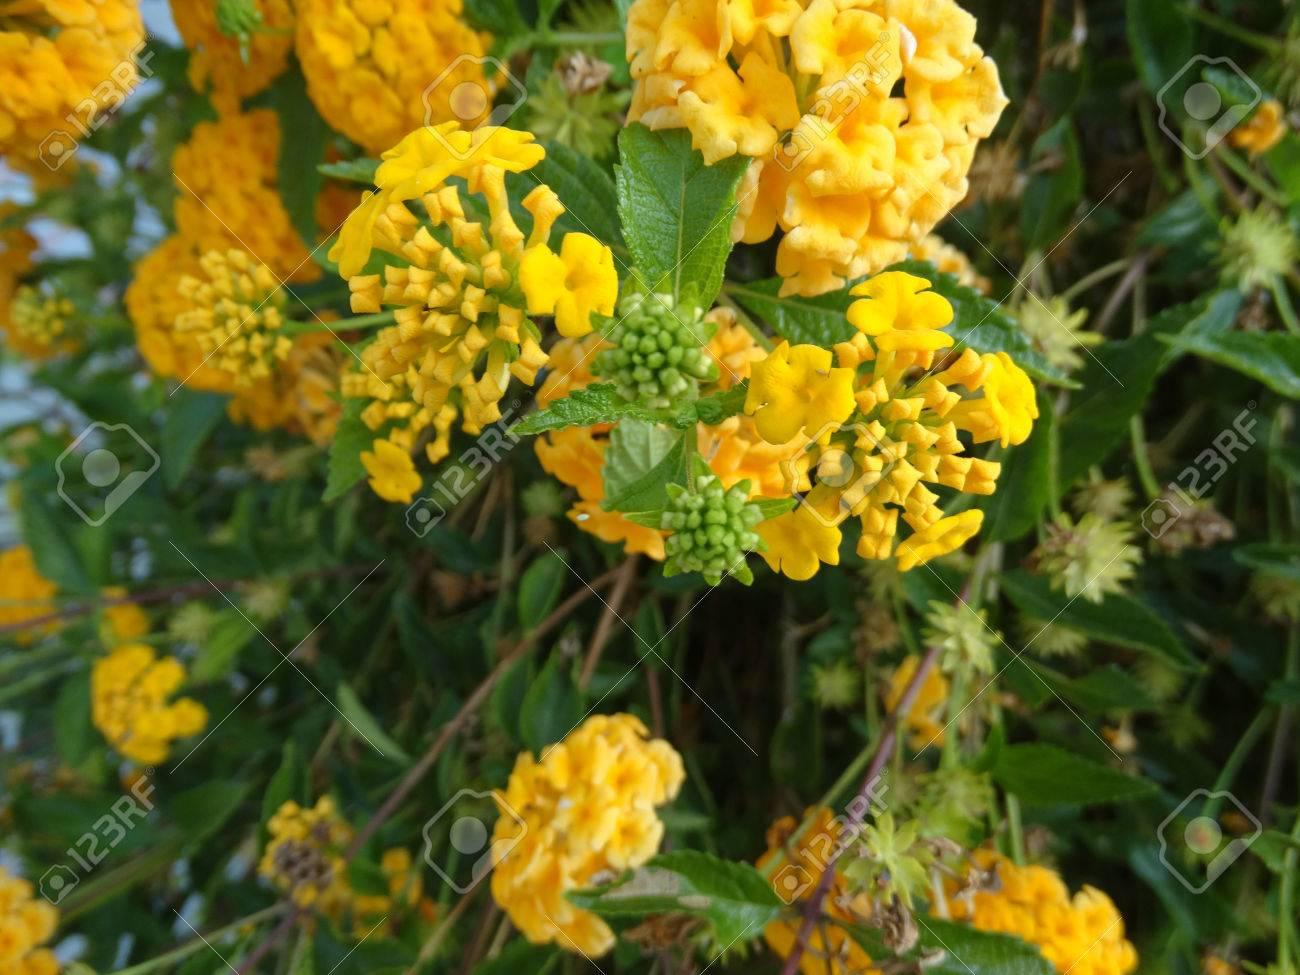 Lantana Camara Gold Mound Low Growing Evergreen Shrub With Stock